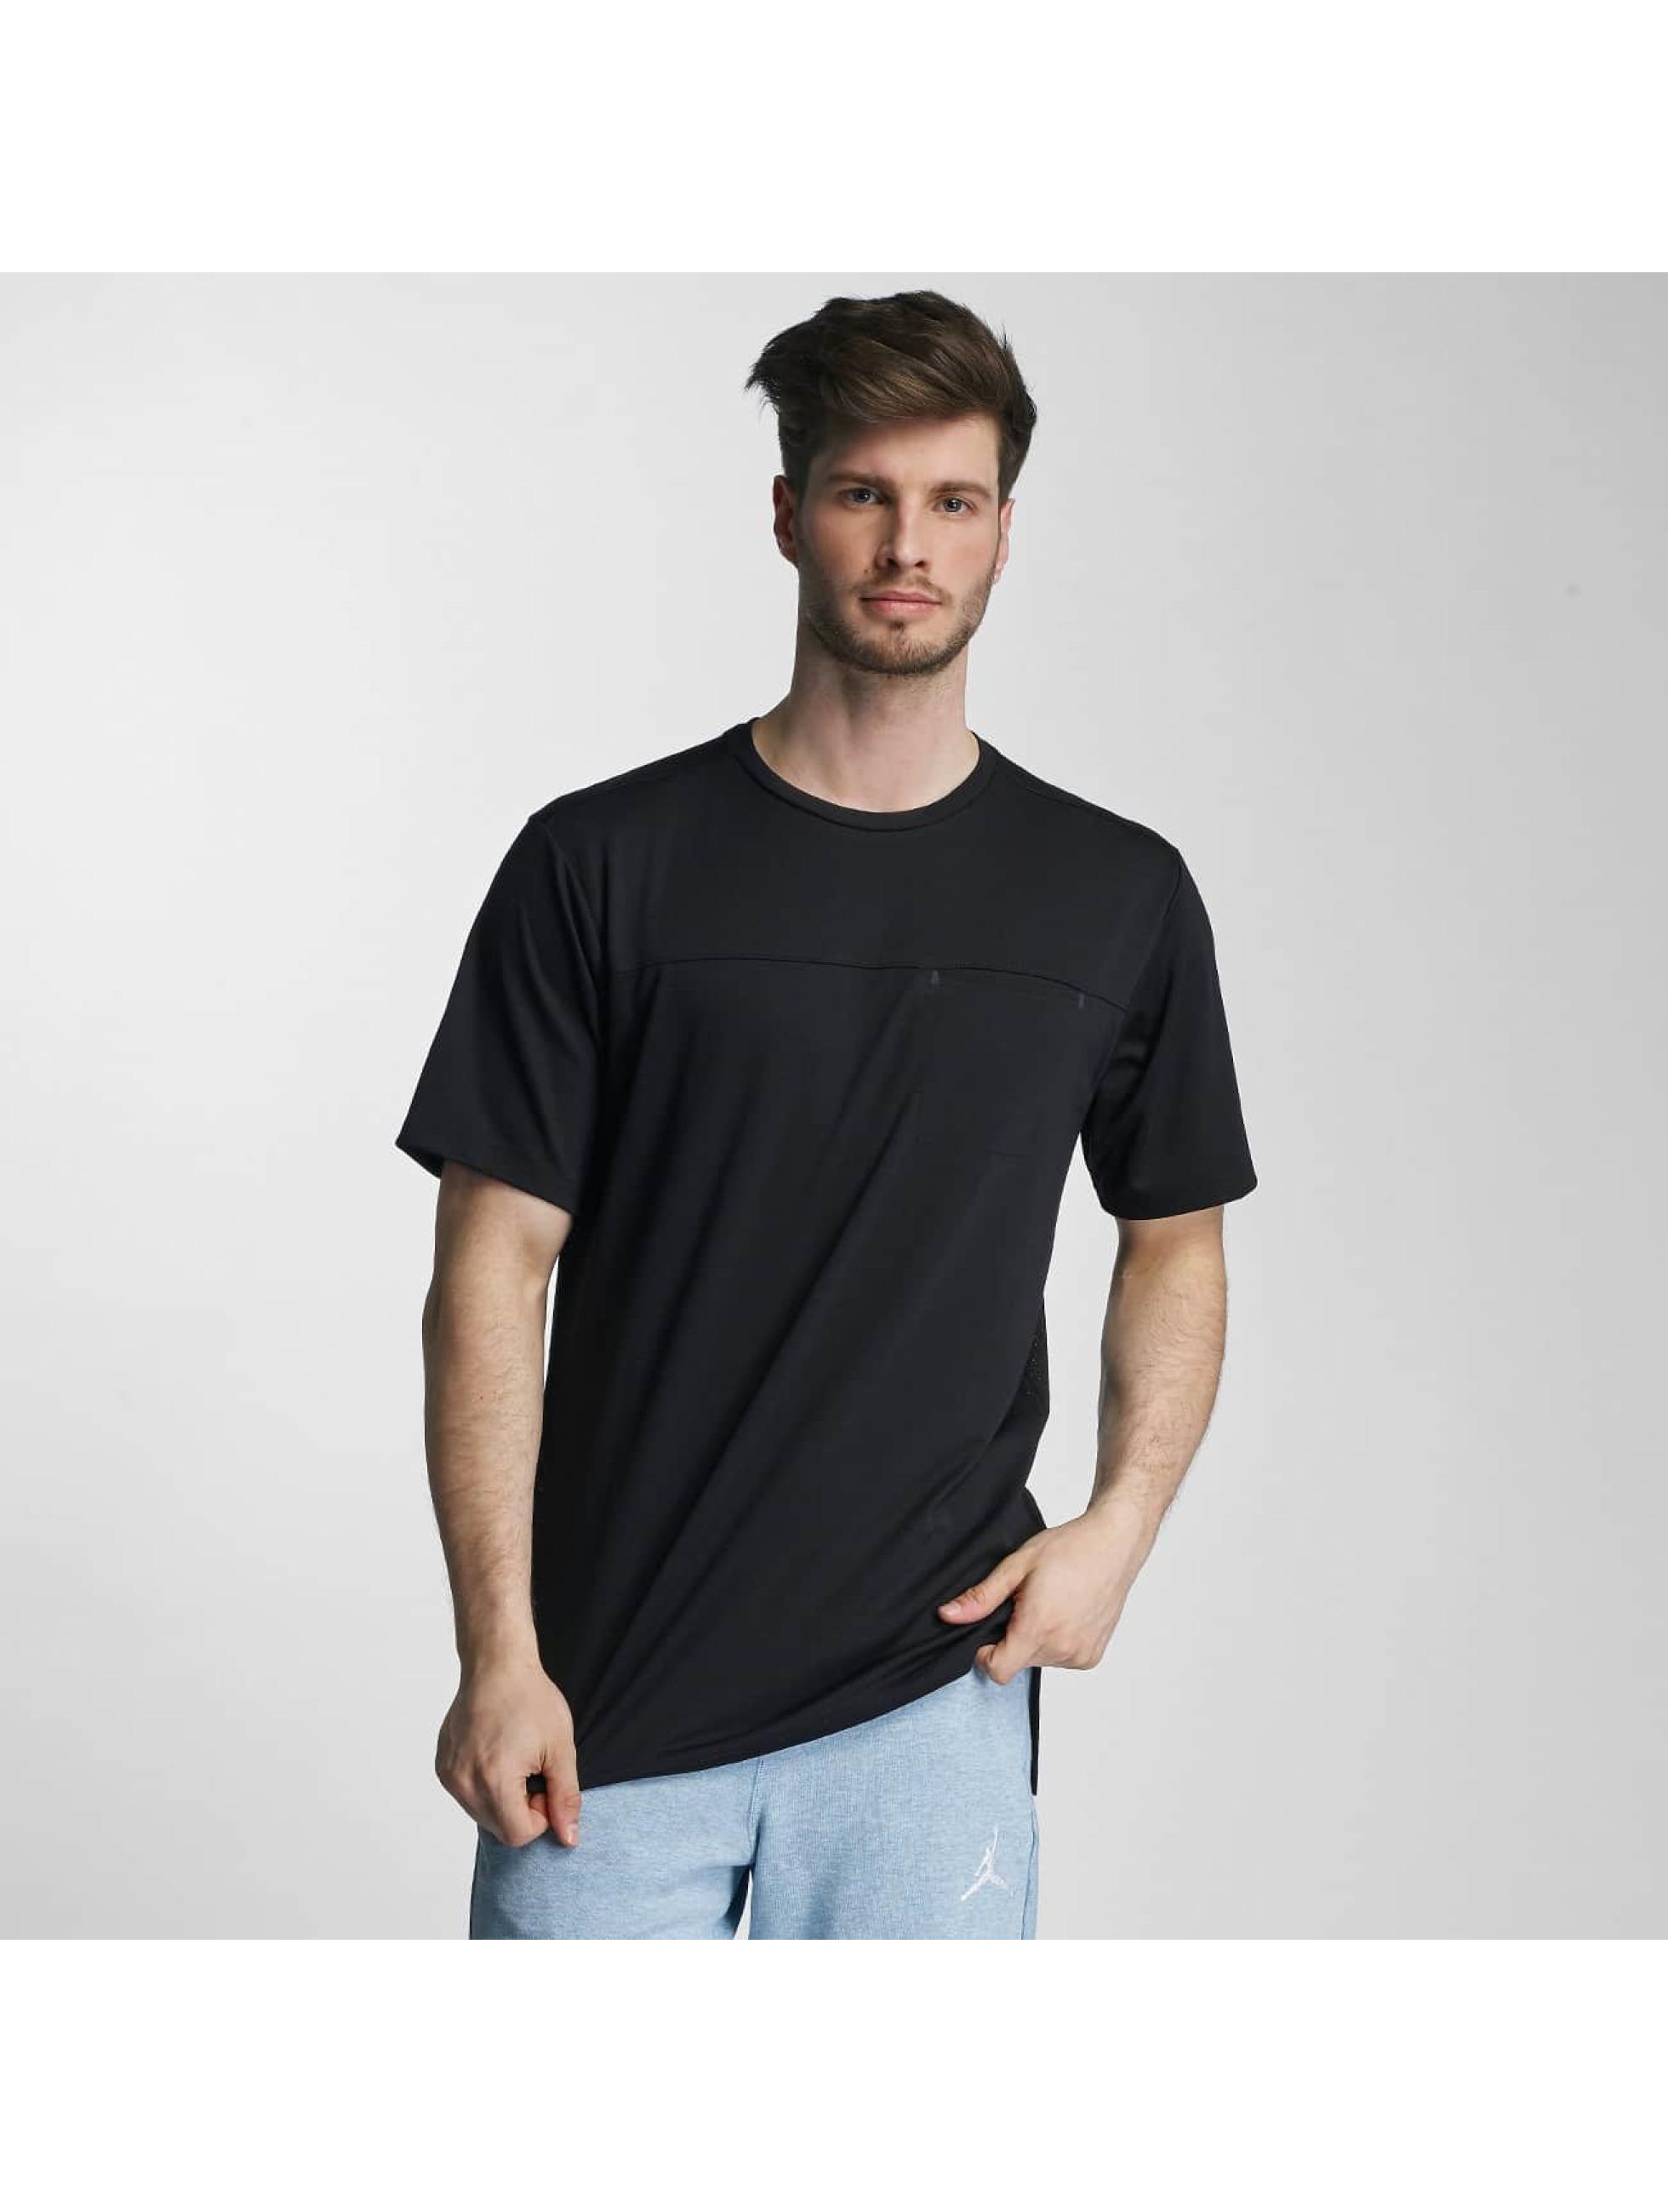 Jordan T-Shirt 23 Lux Classic Pocket black